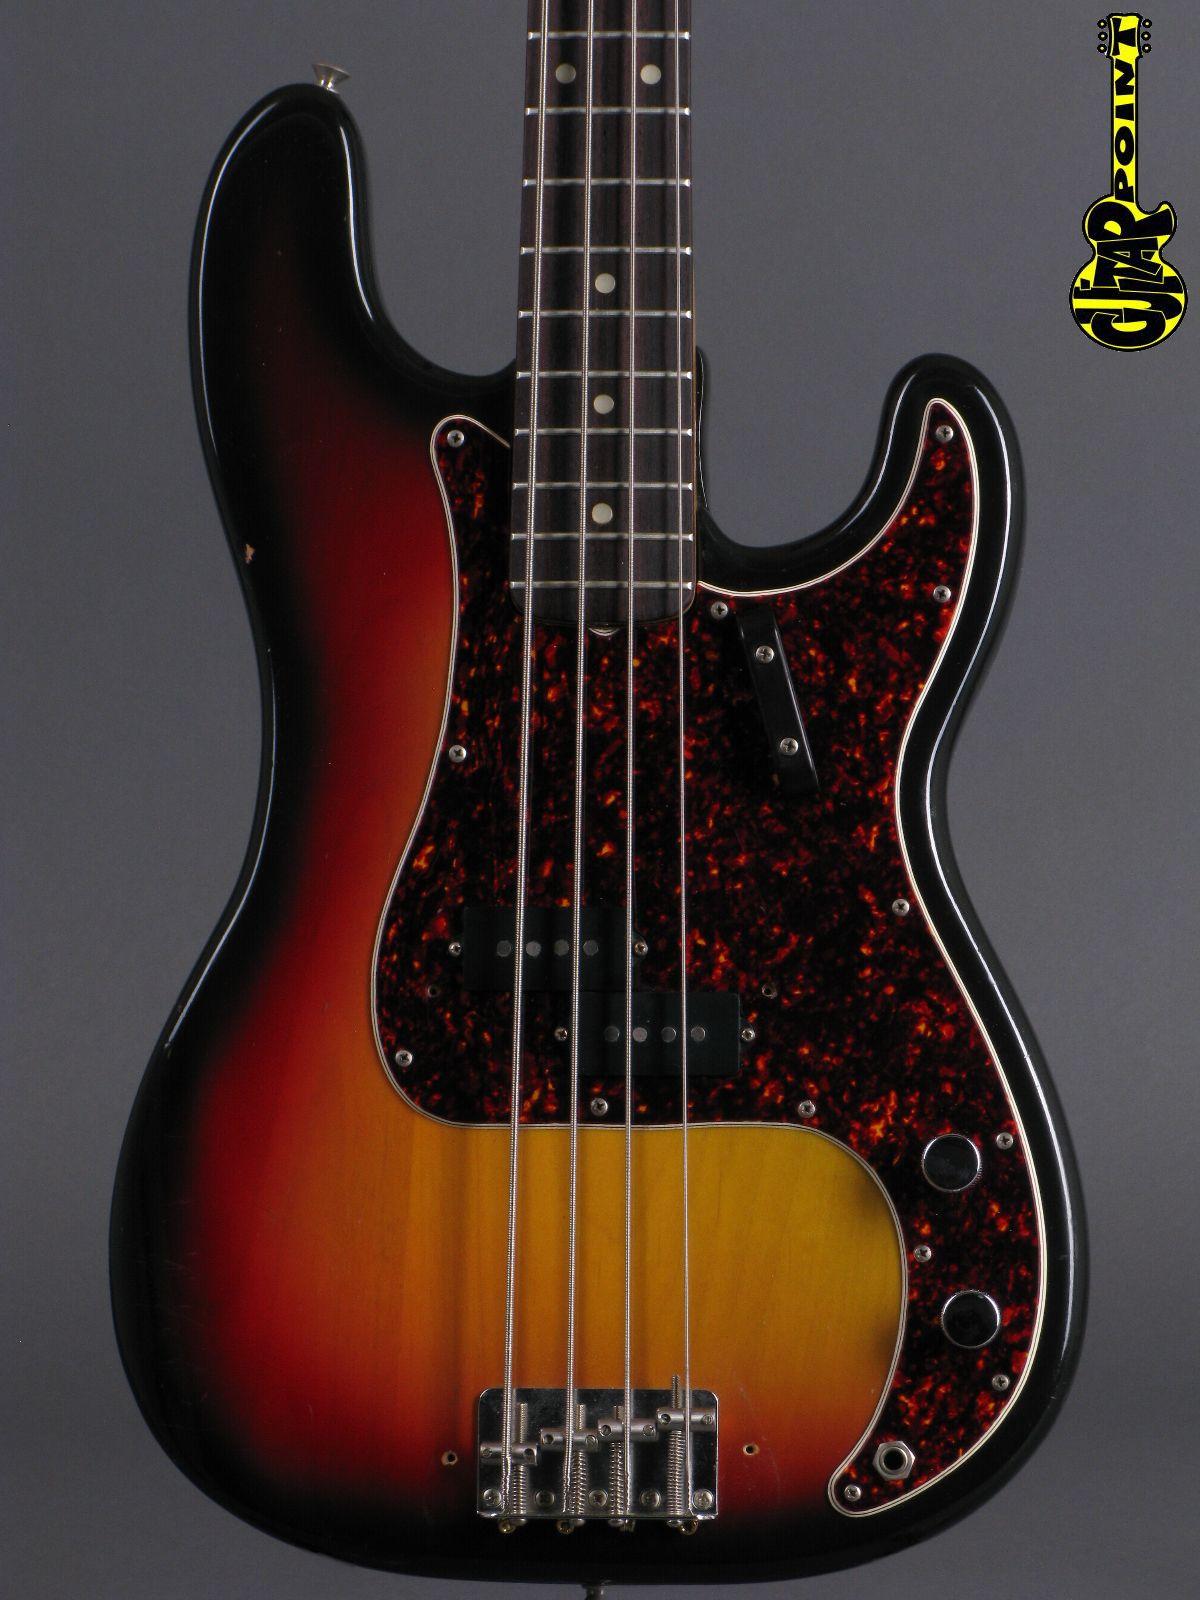 1972 Fender Precision Bass - 3t-Sunburst